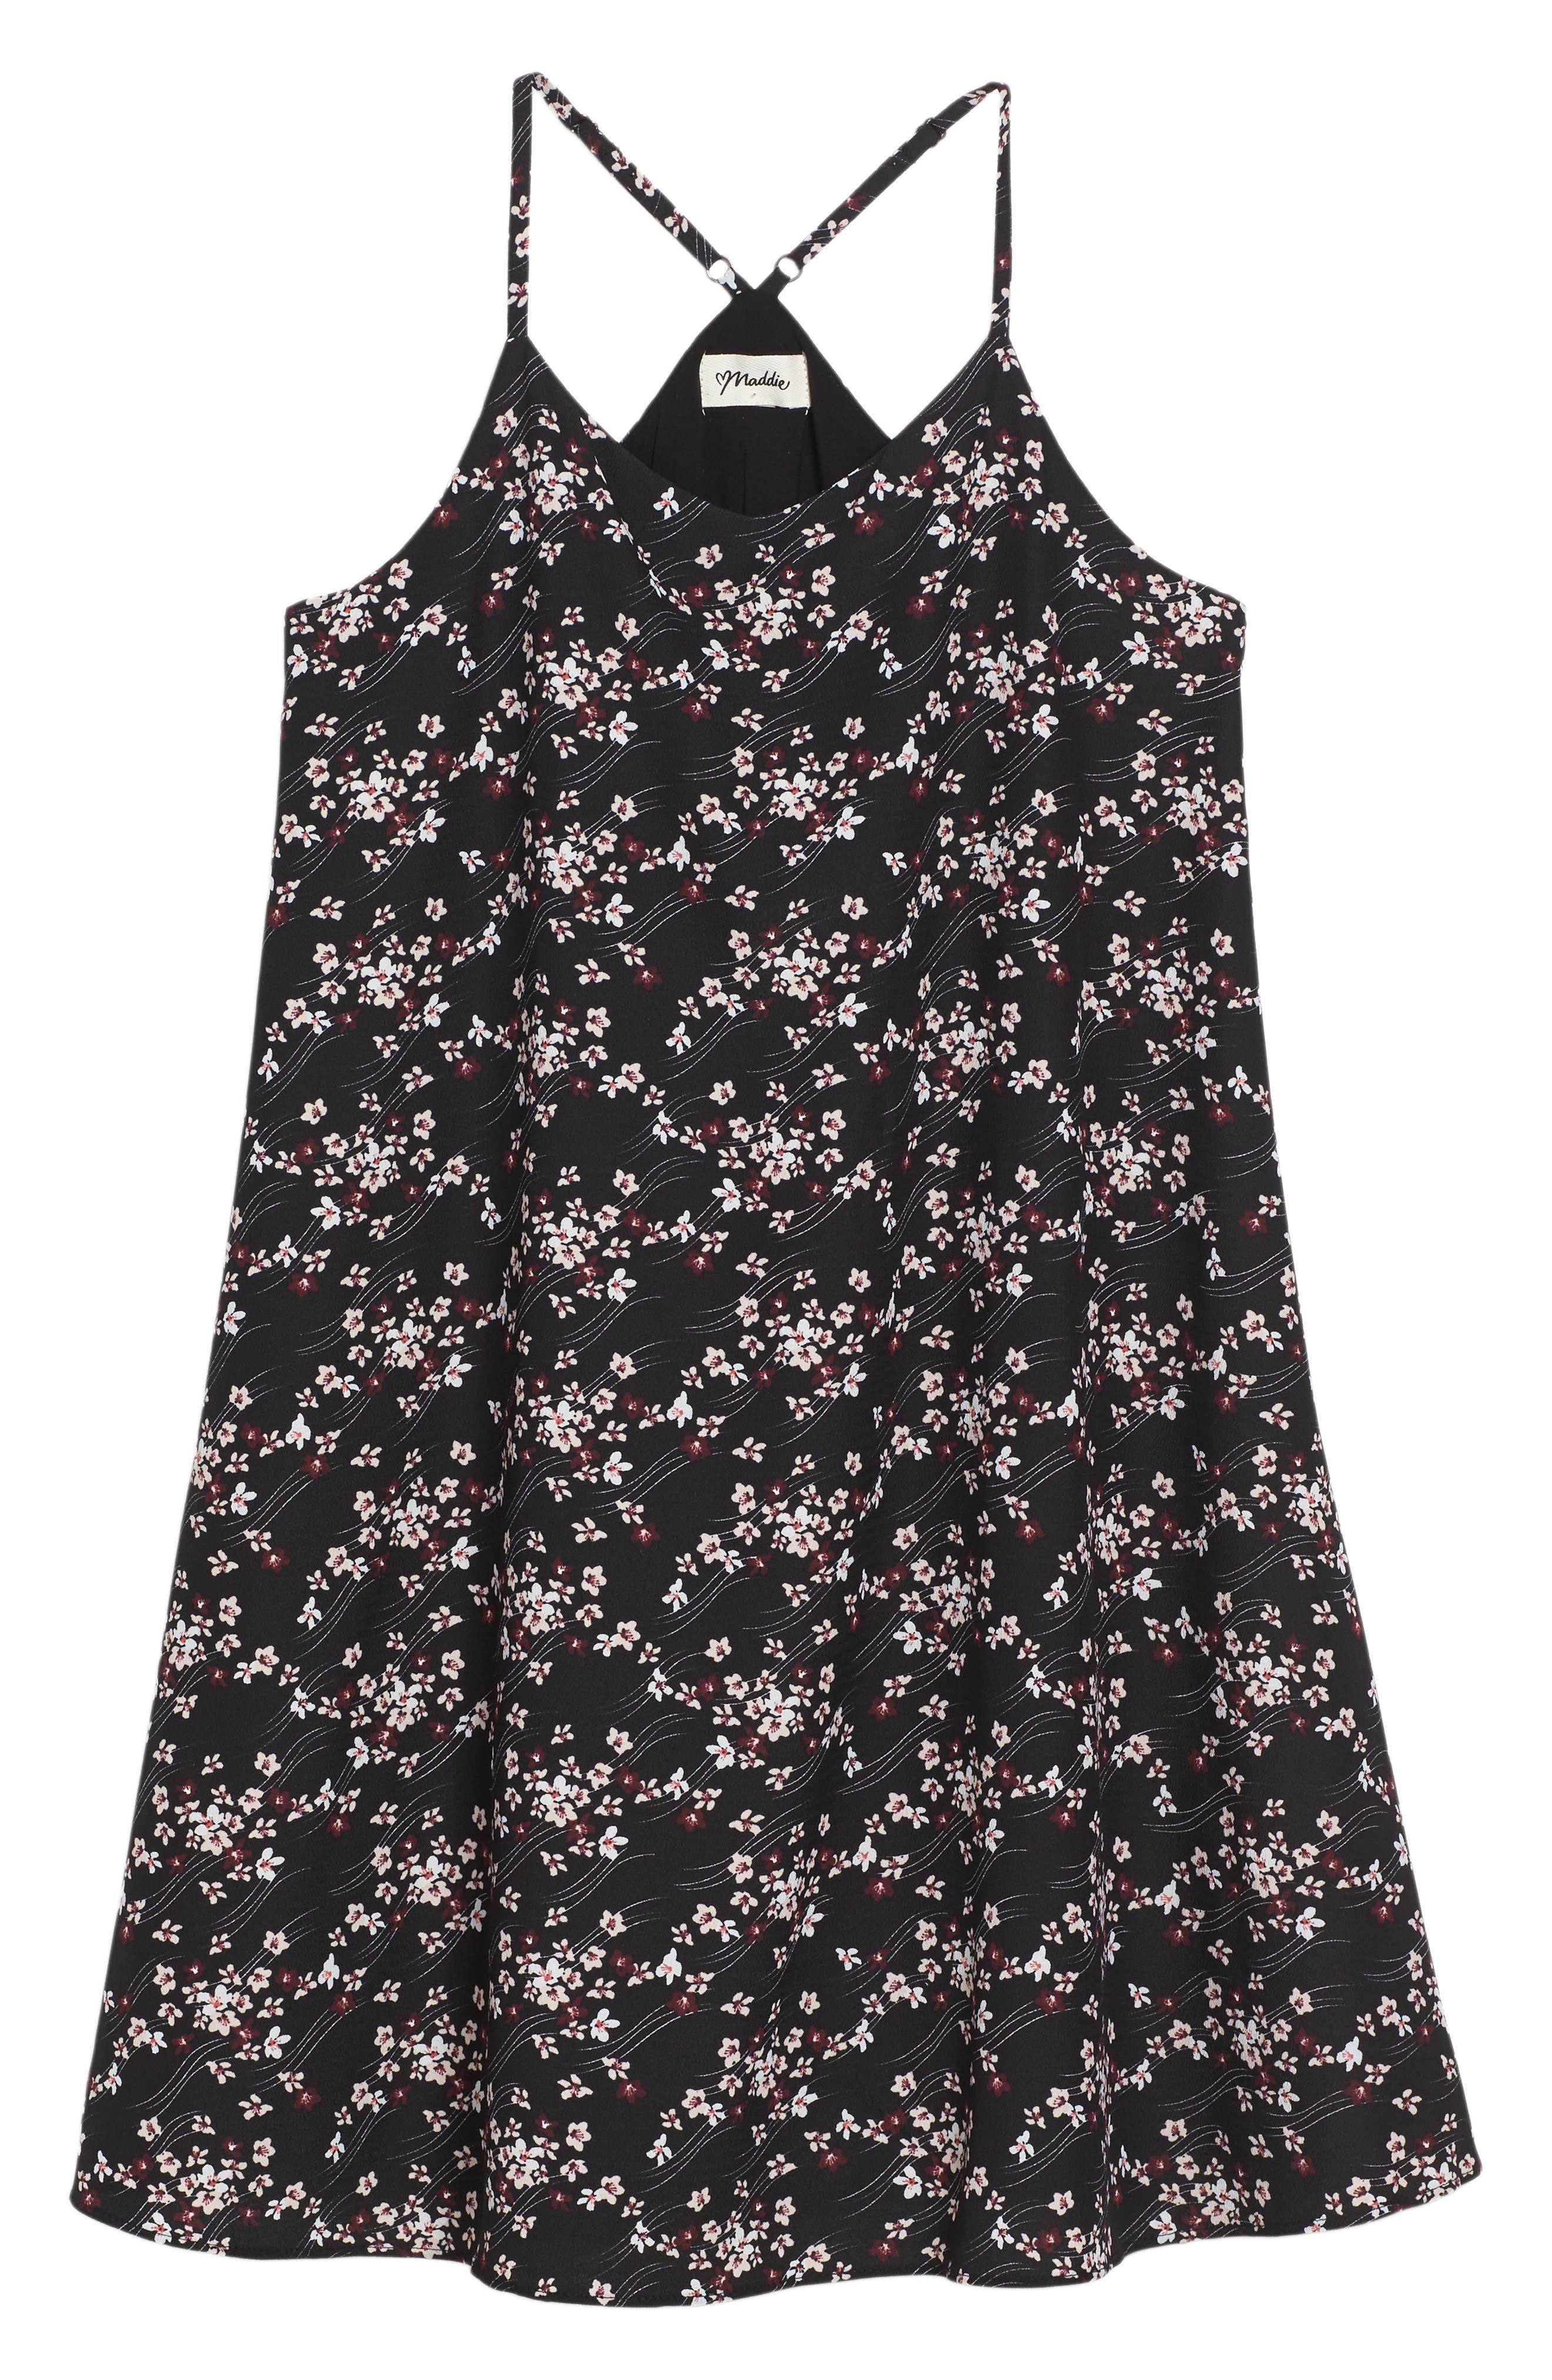 Main Image - Maddie Floral Print Slip Dress (Big Girls)